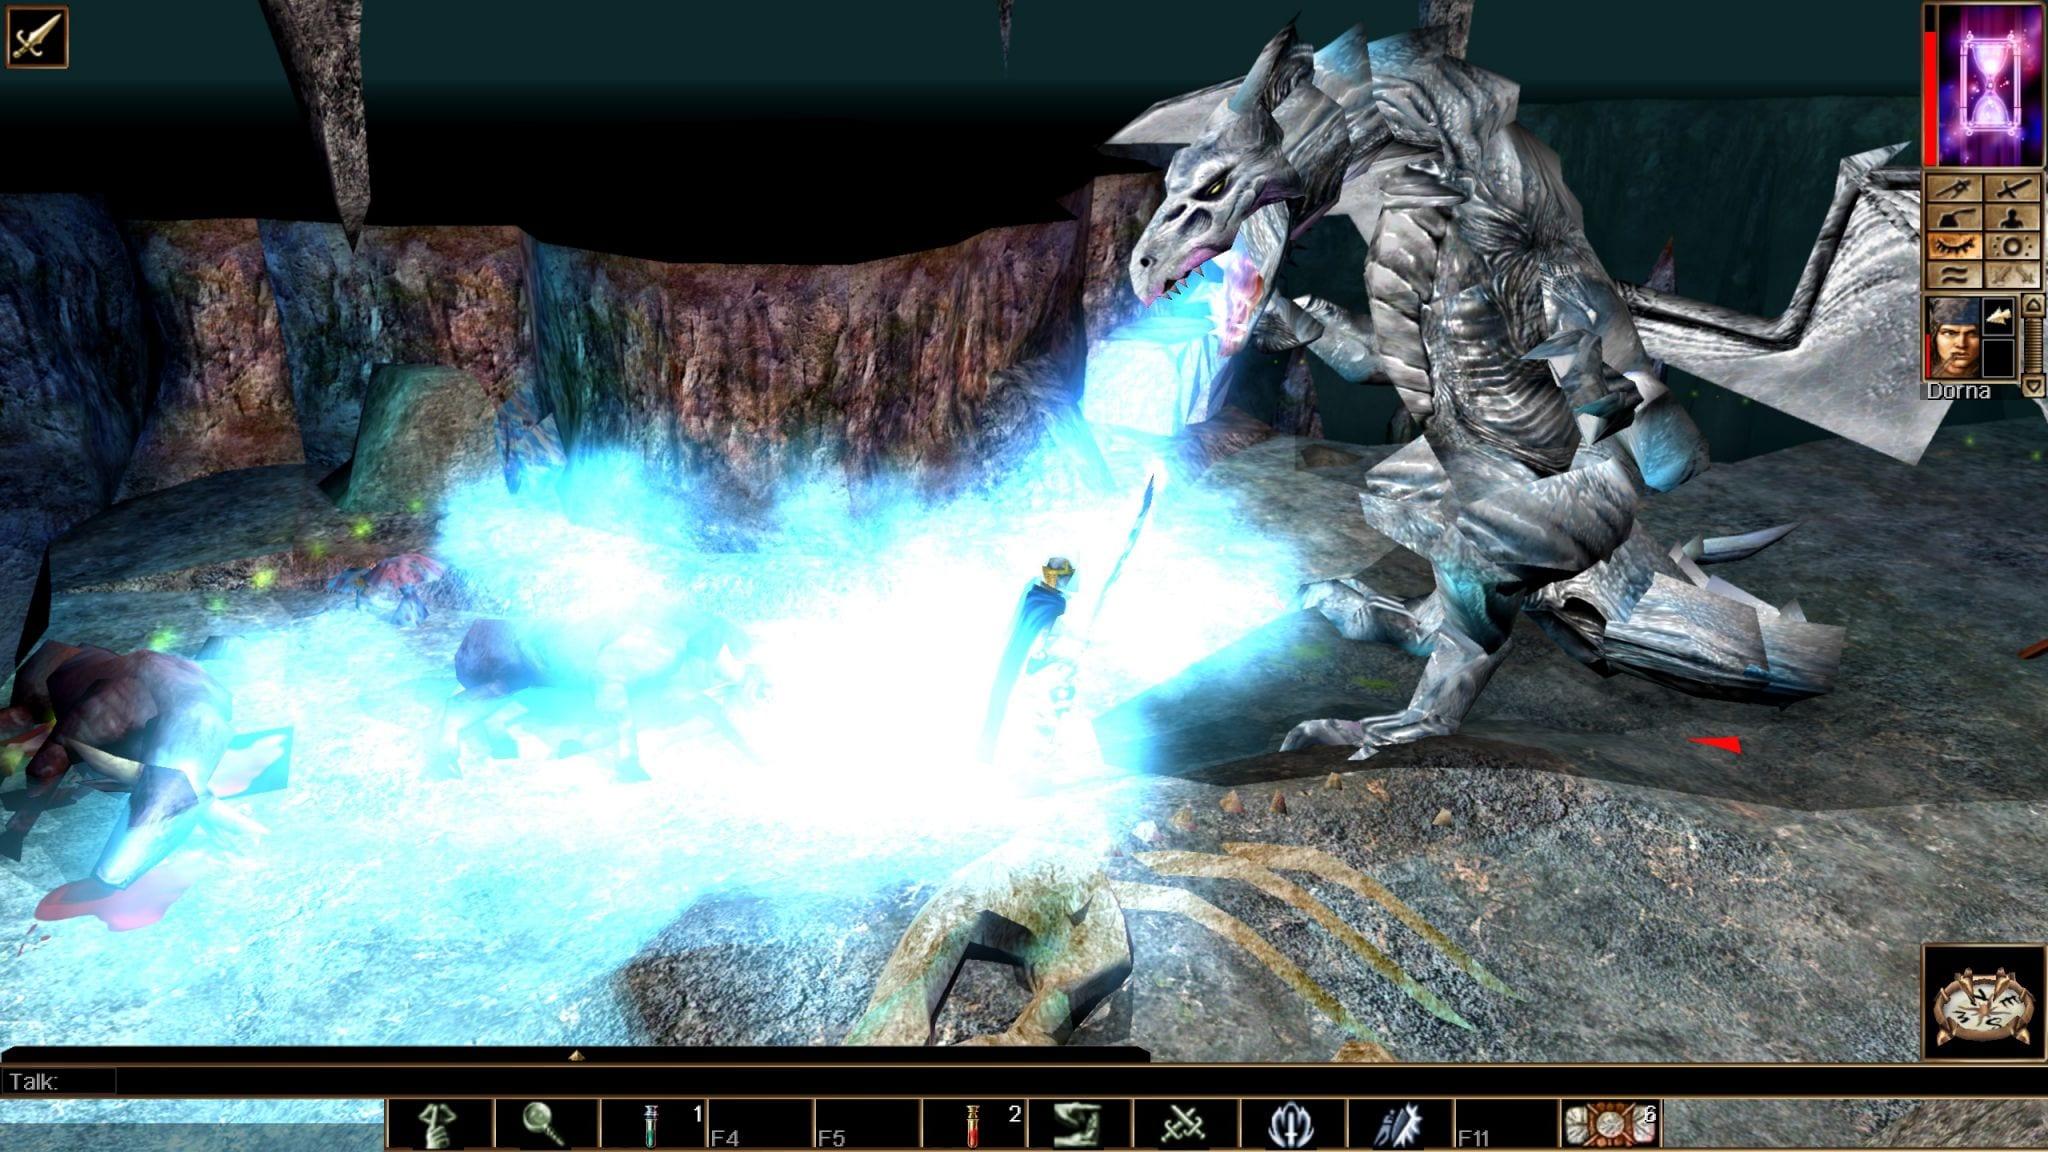 Beamdog Announces The Neverwinter Nights: Enhanced Edition